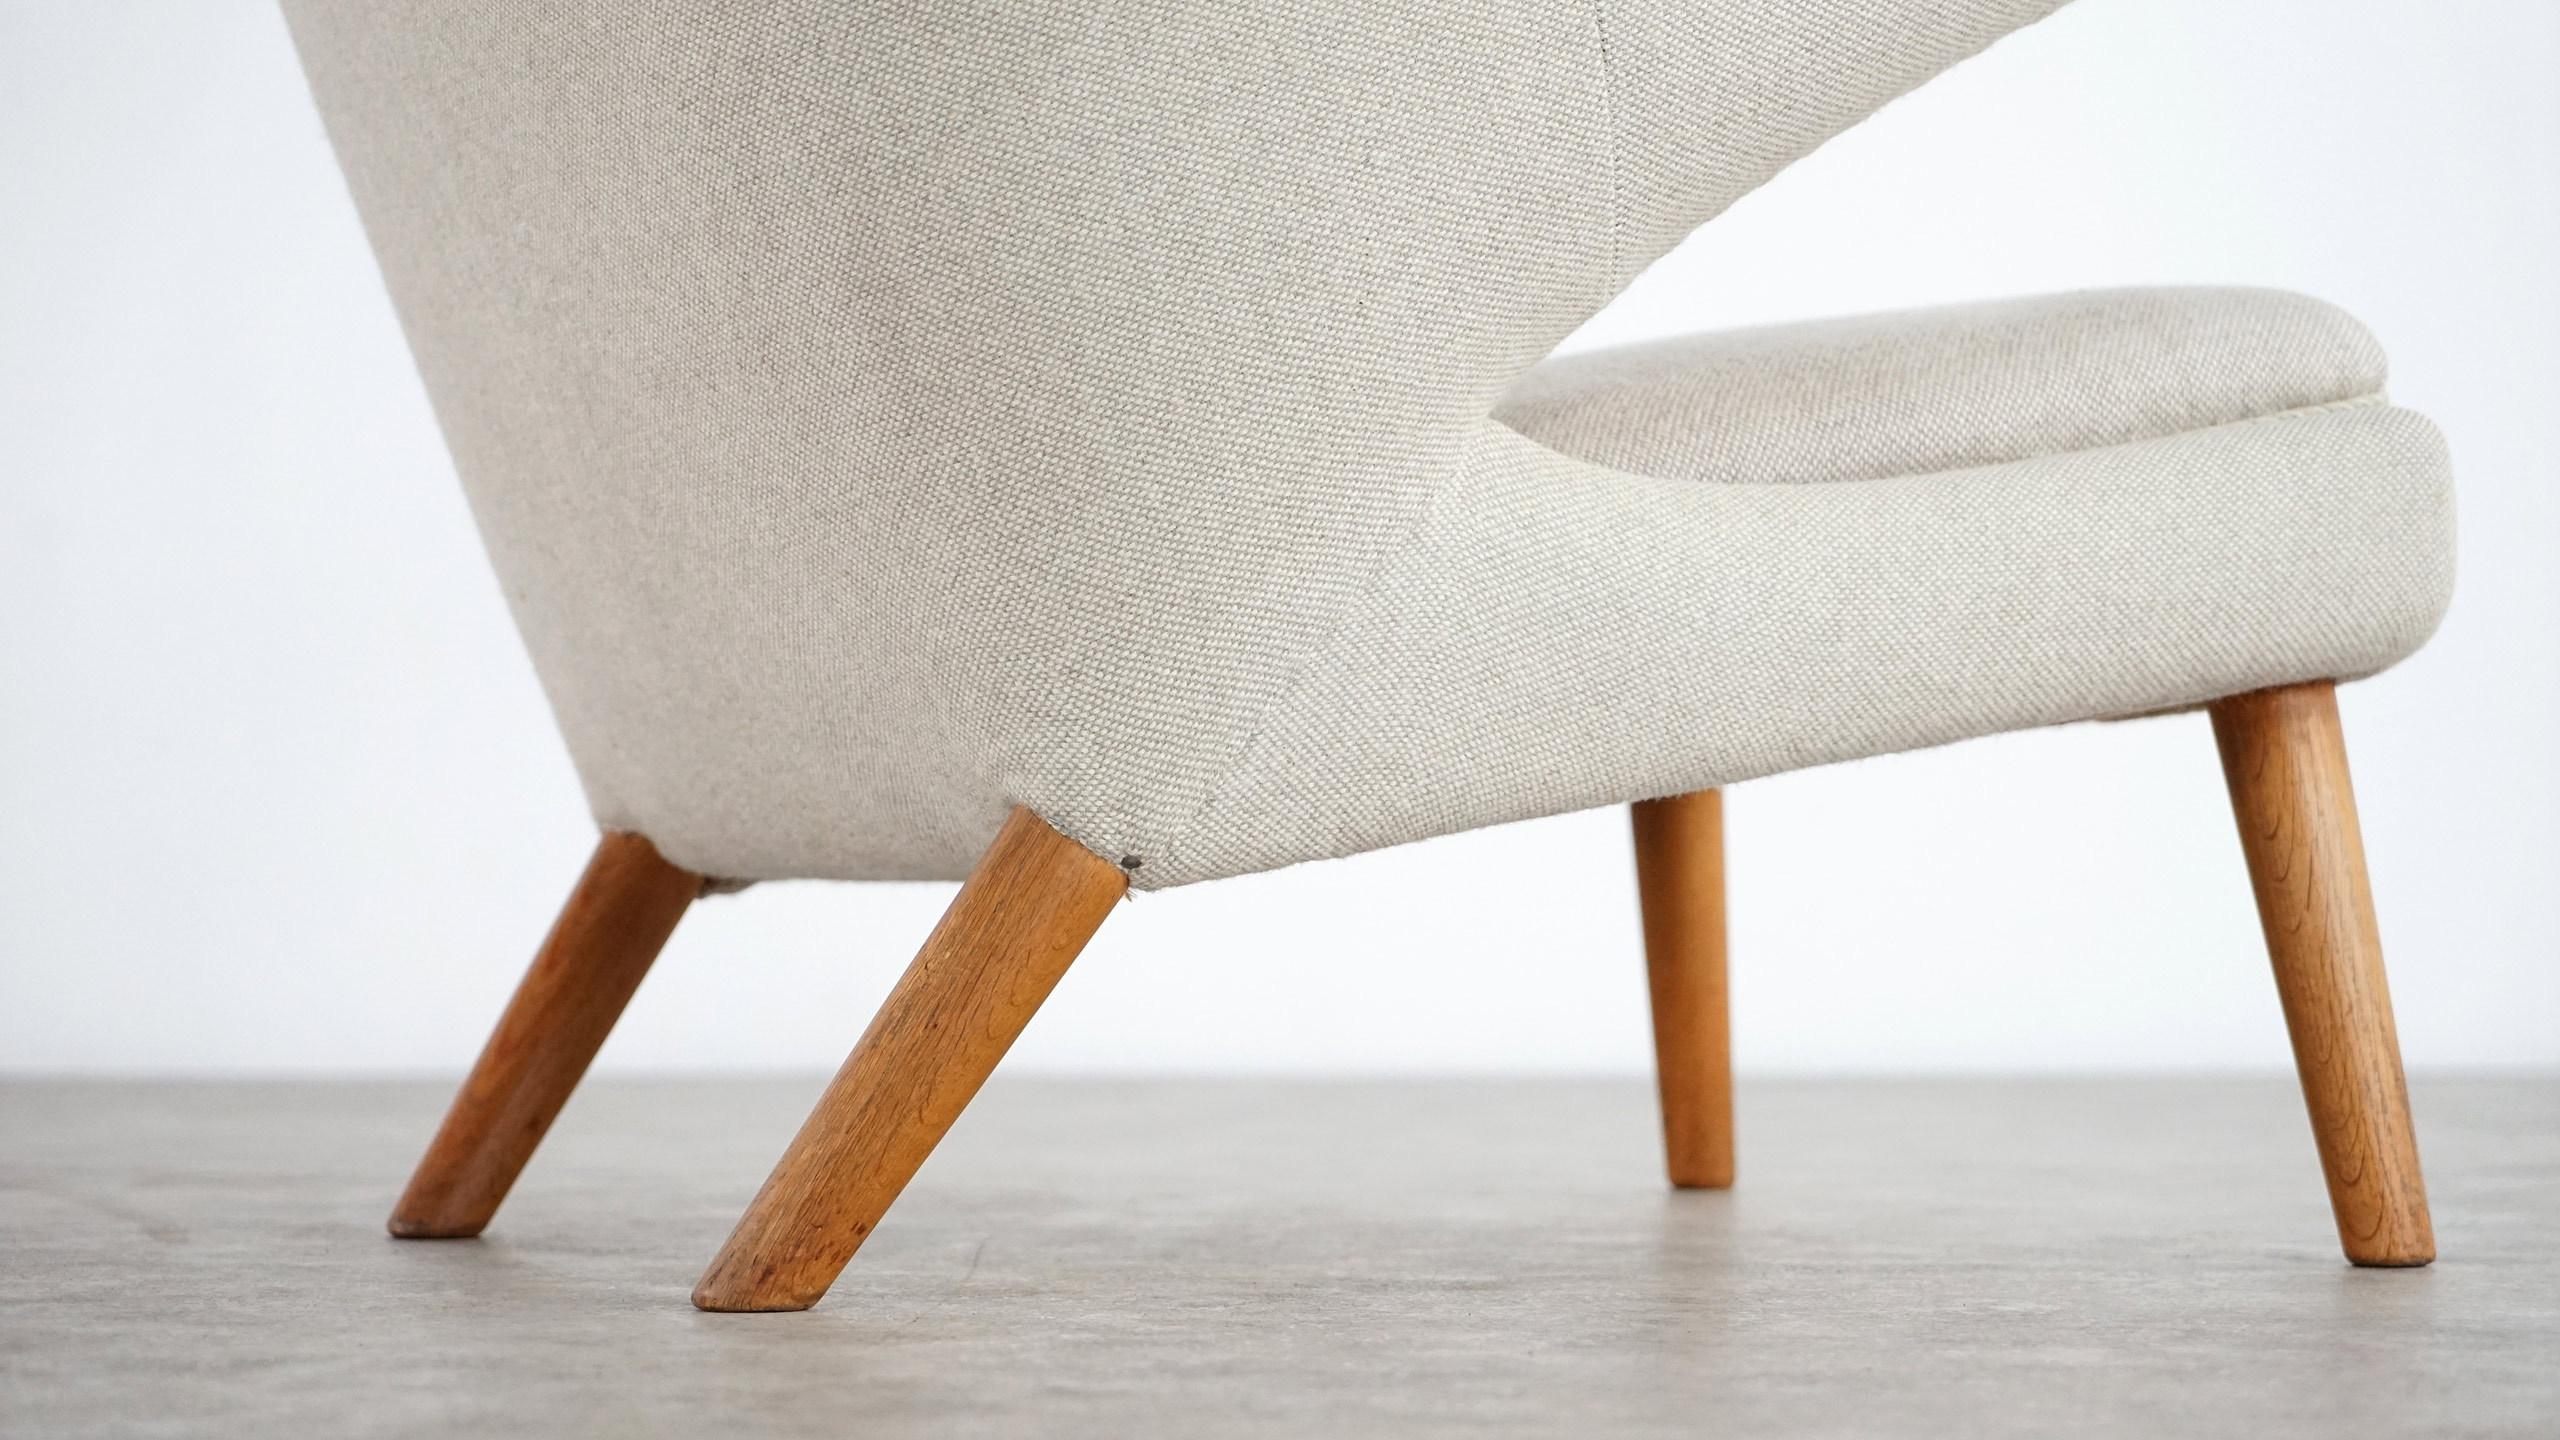 28 papa bear sessel kaufen papa bear chair hans. Black Bedroom Furniture Sets. Home Design Ideas